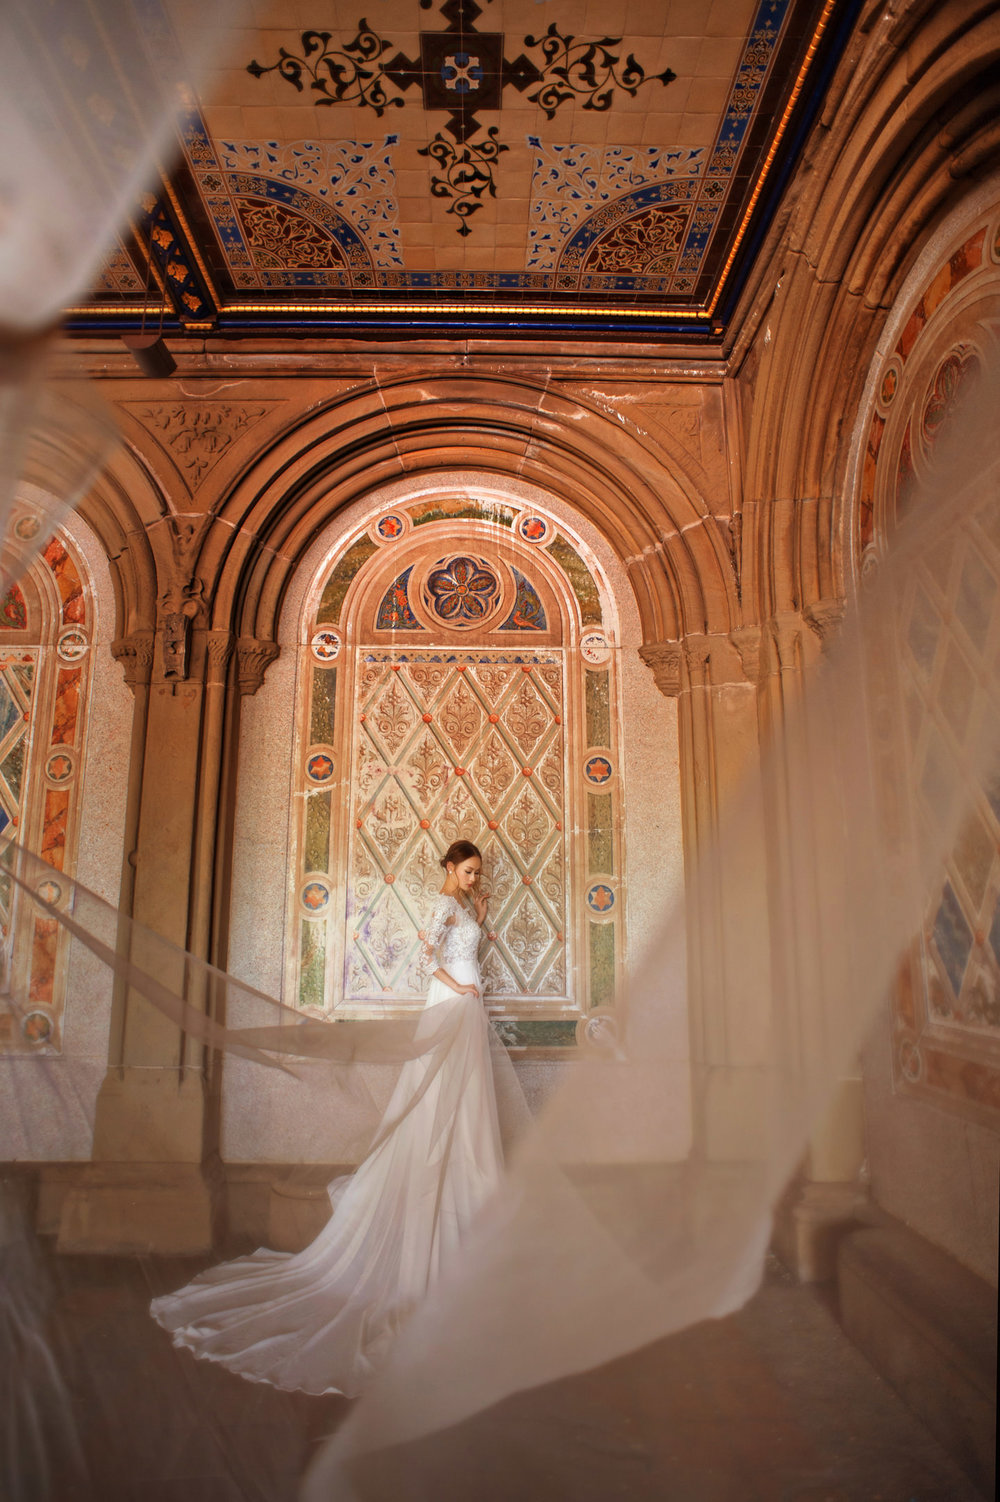 Chris_Hui_婚禮_婚紗照_pre_wedding_photography_best_055_.jpg